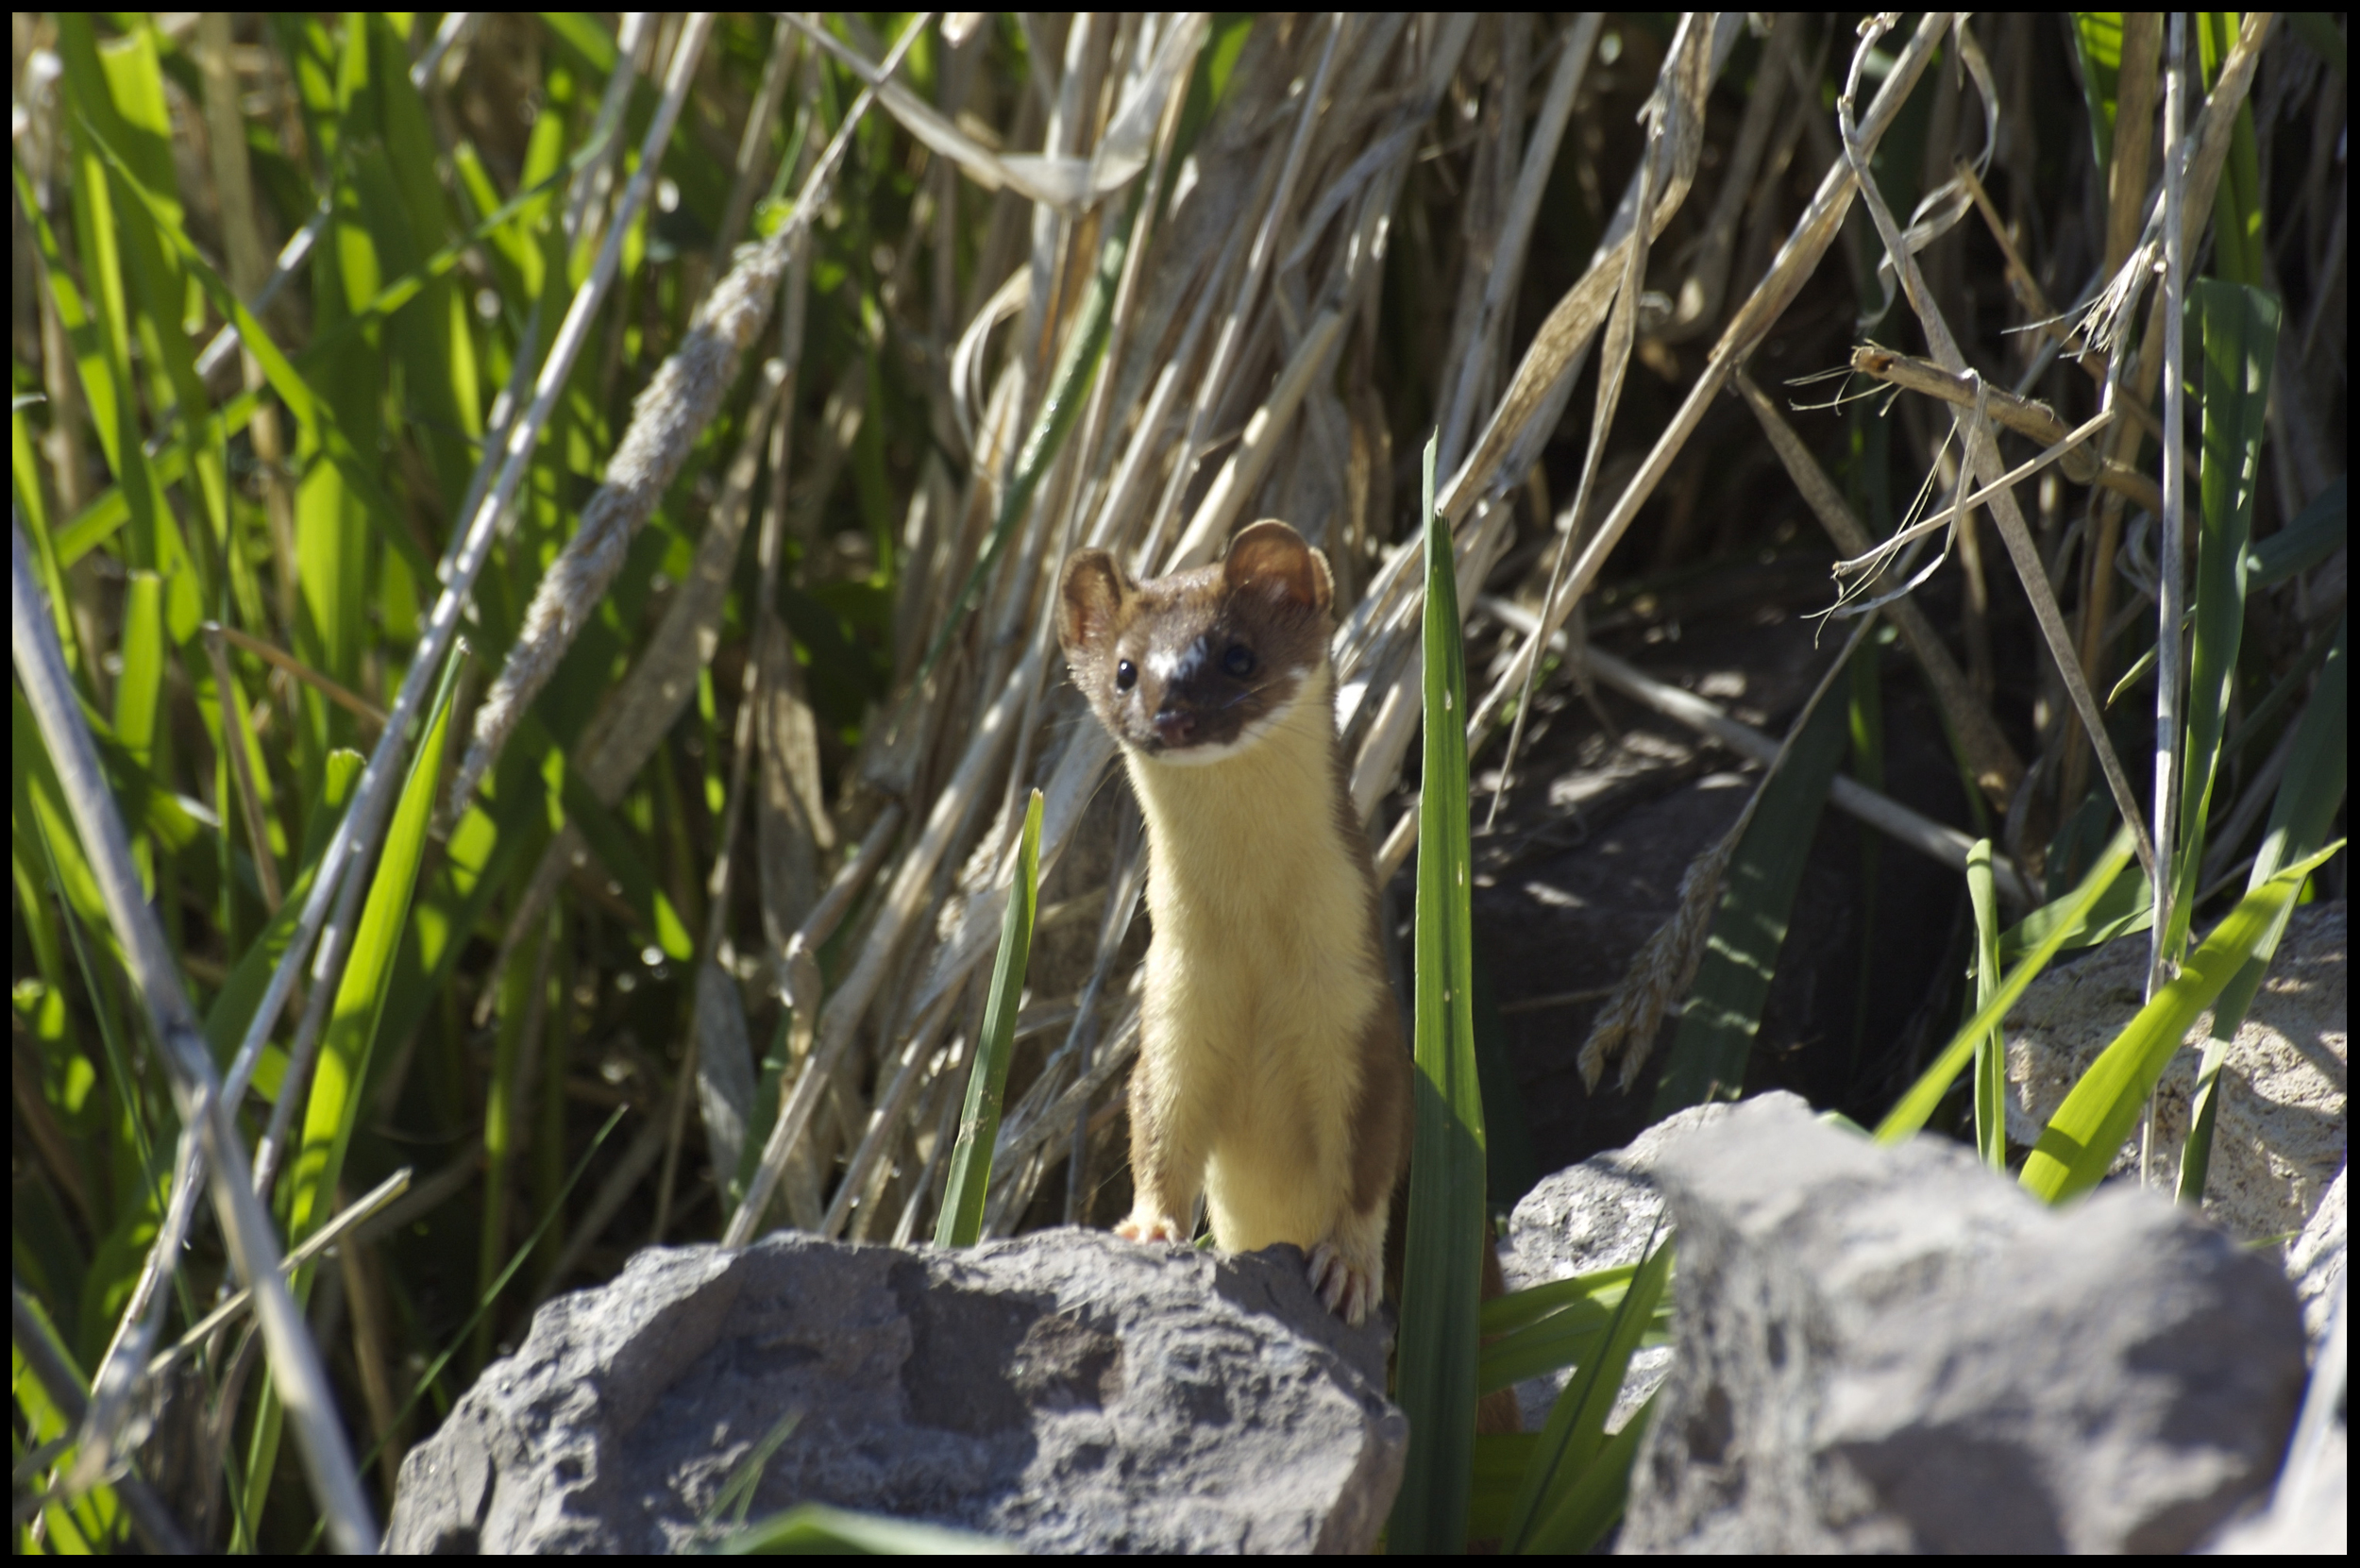 Long-tailed Weasel, Malheur National Wildlife Refuge, OR